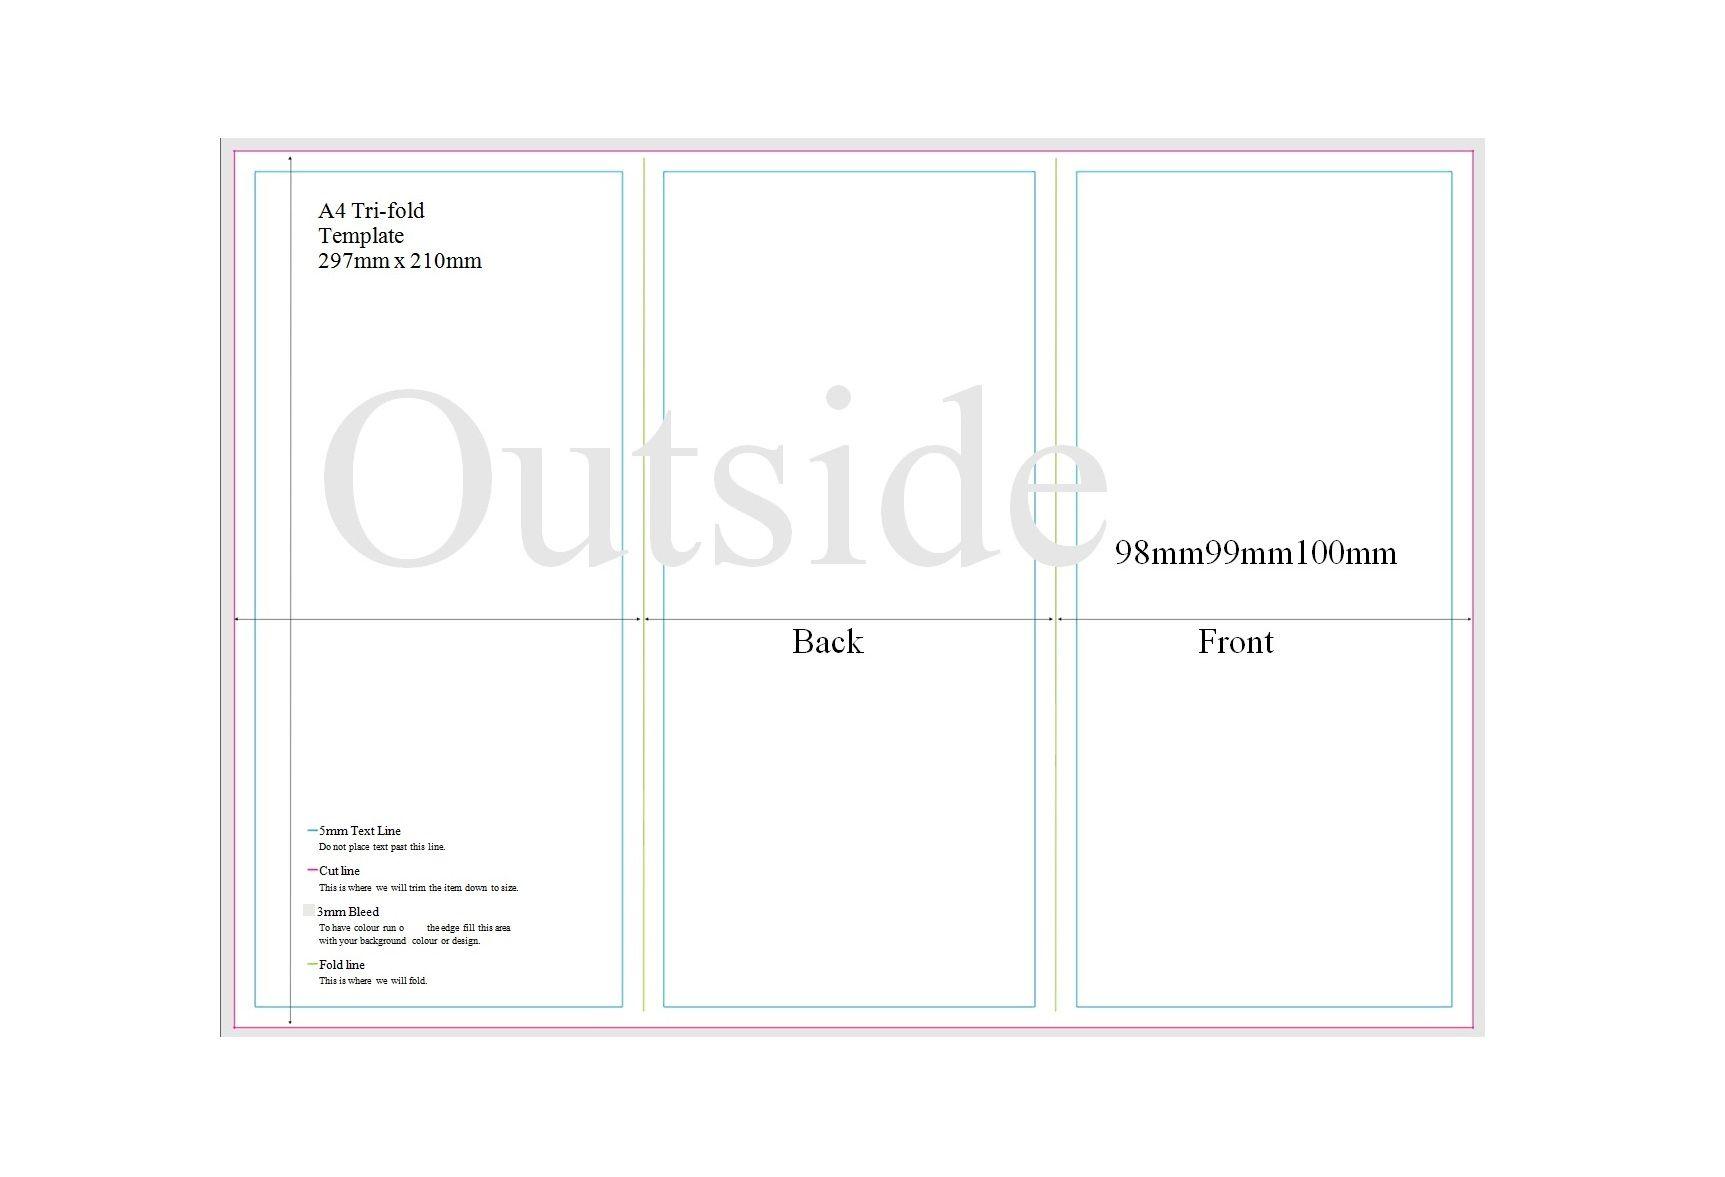 Google Doc Brochure Template All Templates Free Brochure Template Pamphlet Template Brochure Examples